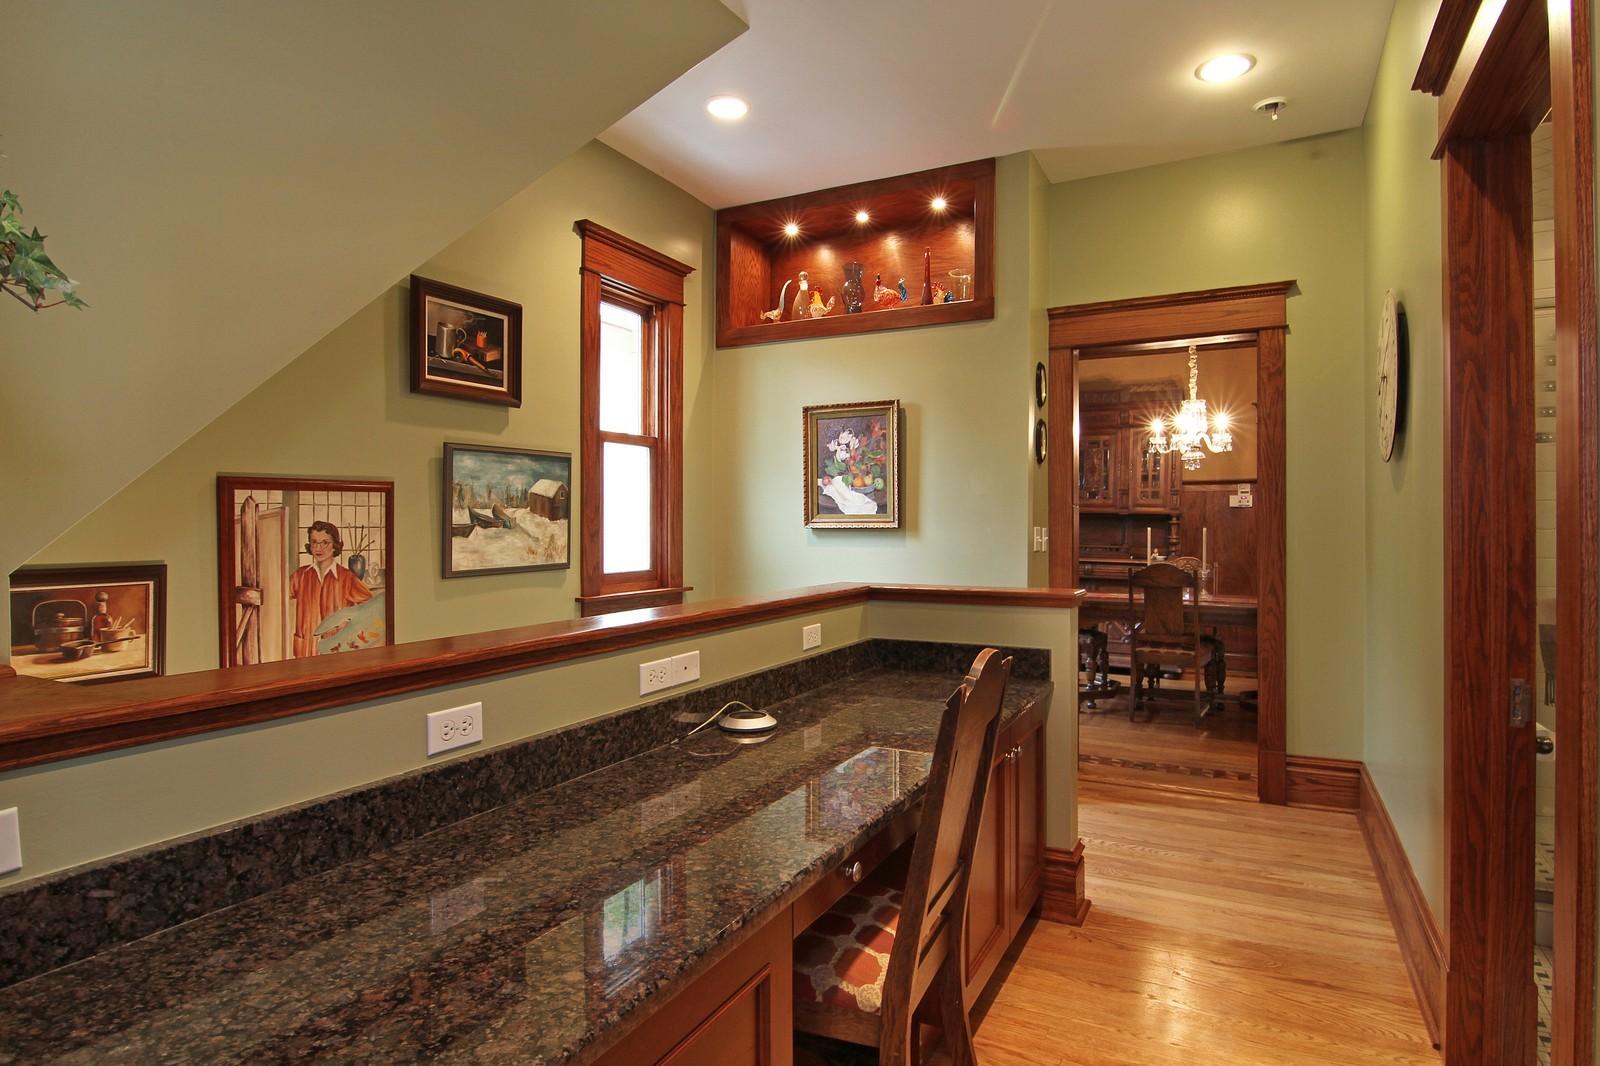 Real Estate Photography - 228 LaGrange Rd, La Grange, IL, 60525 - Hallway